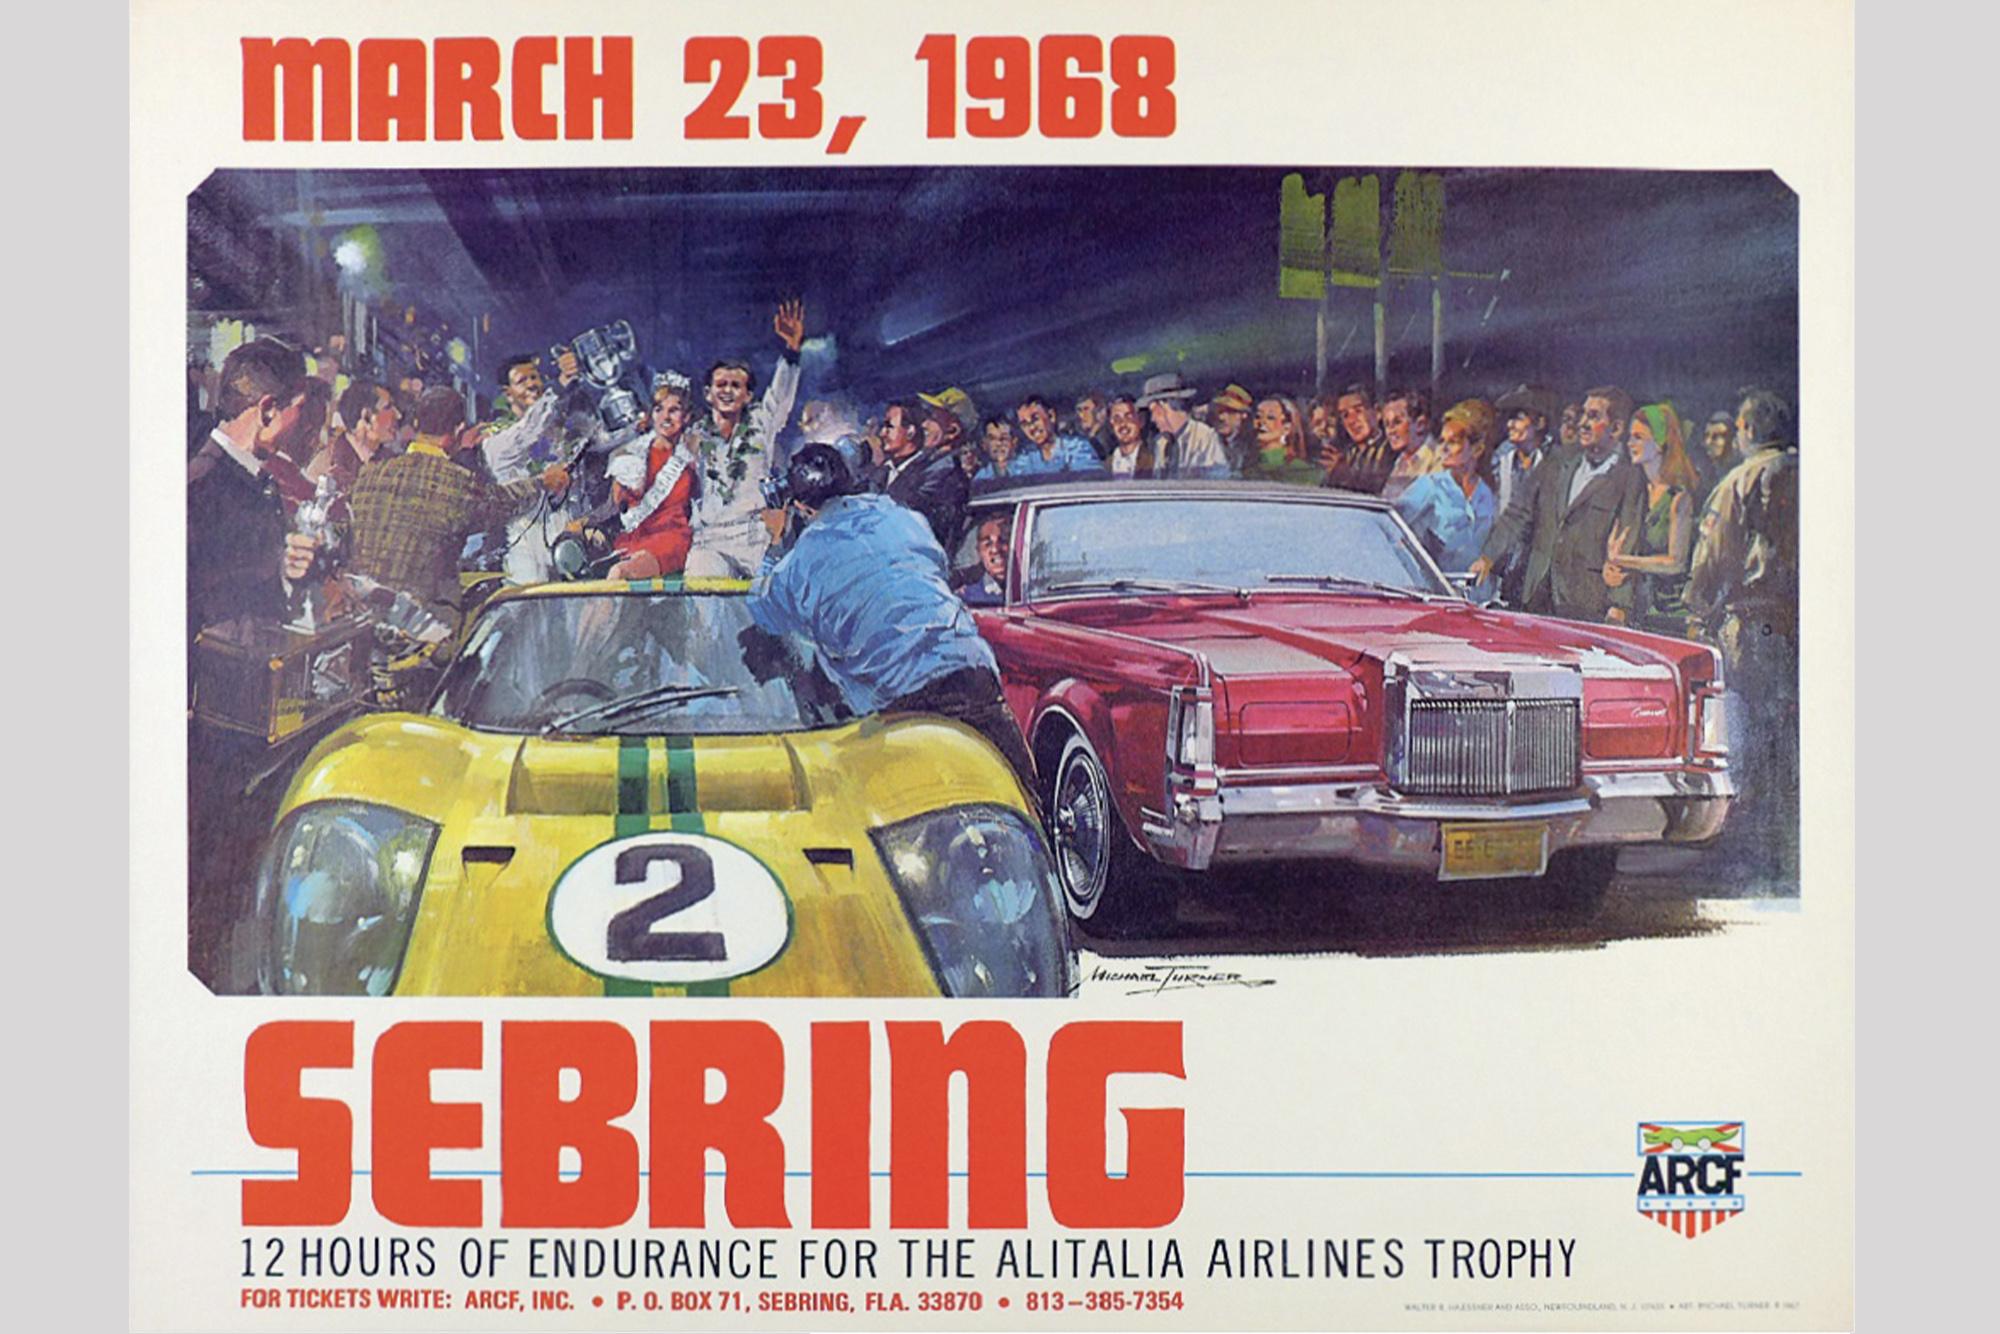 1968 Sebring poster